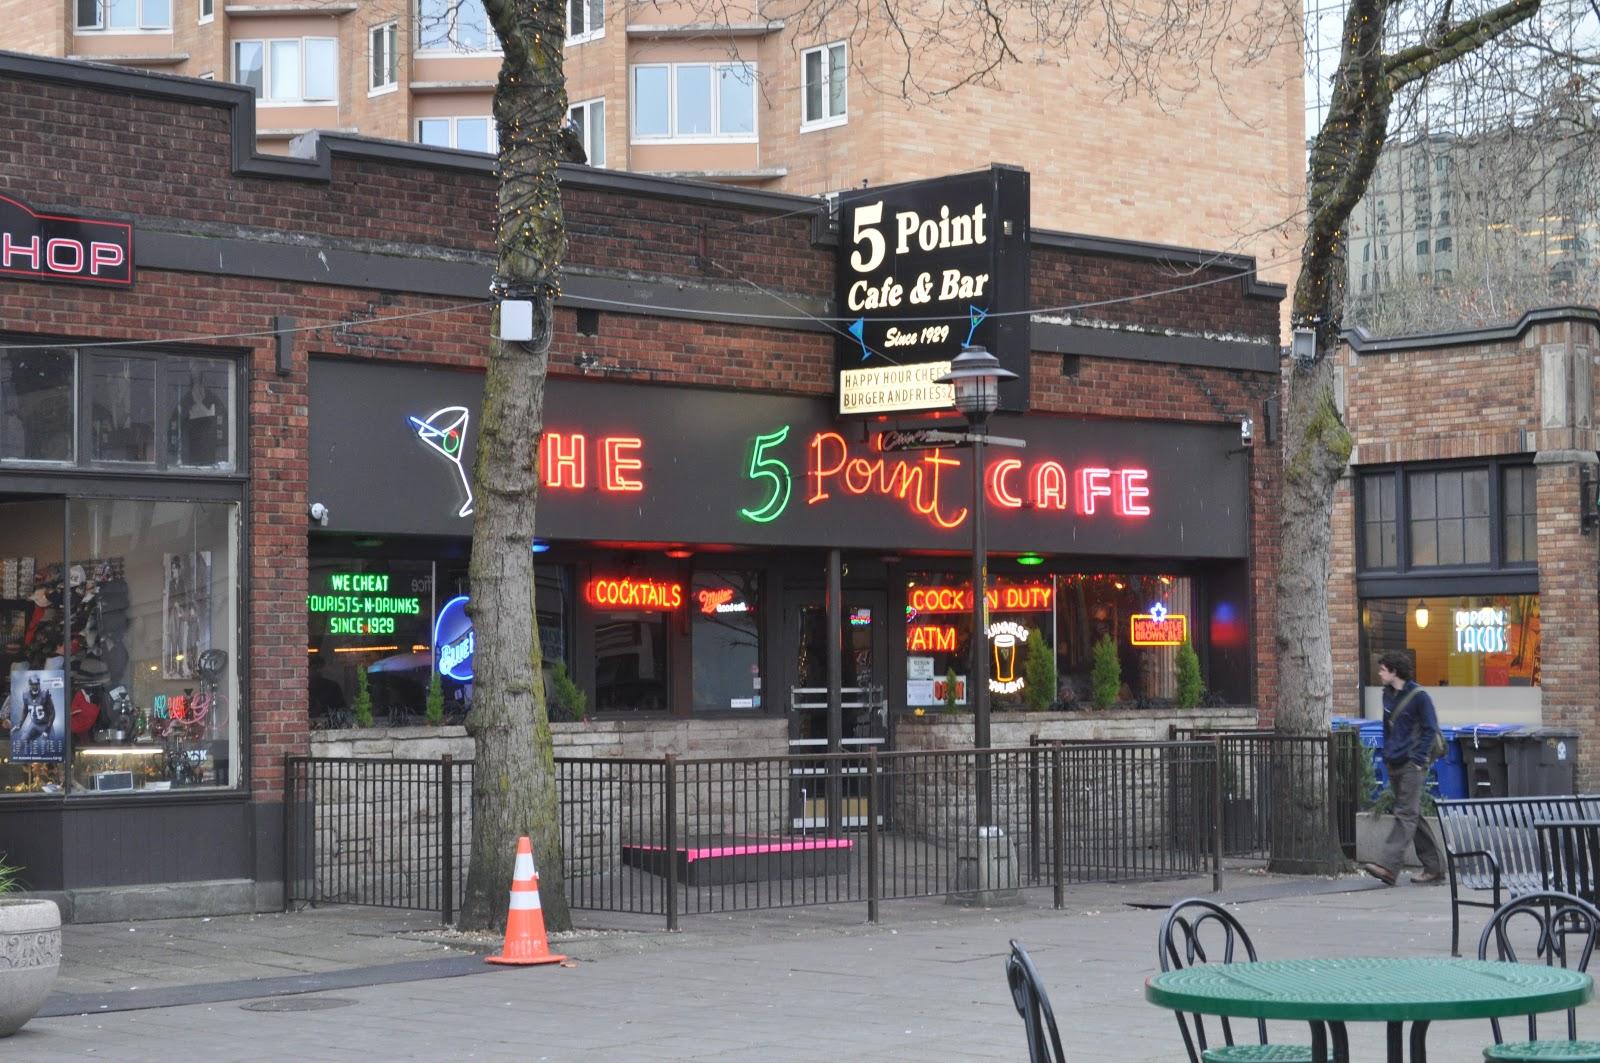 Seattle_-_Five_Point_Cafe_01 (1) 2.jpg